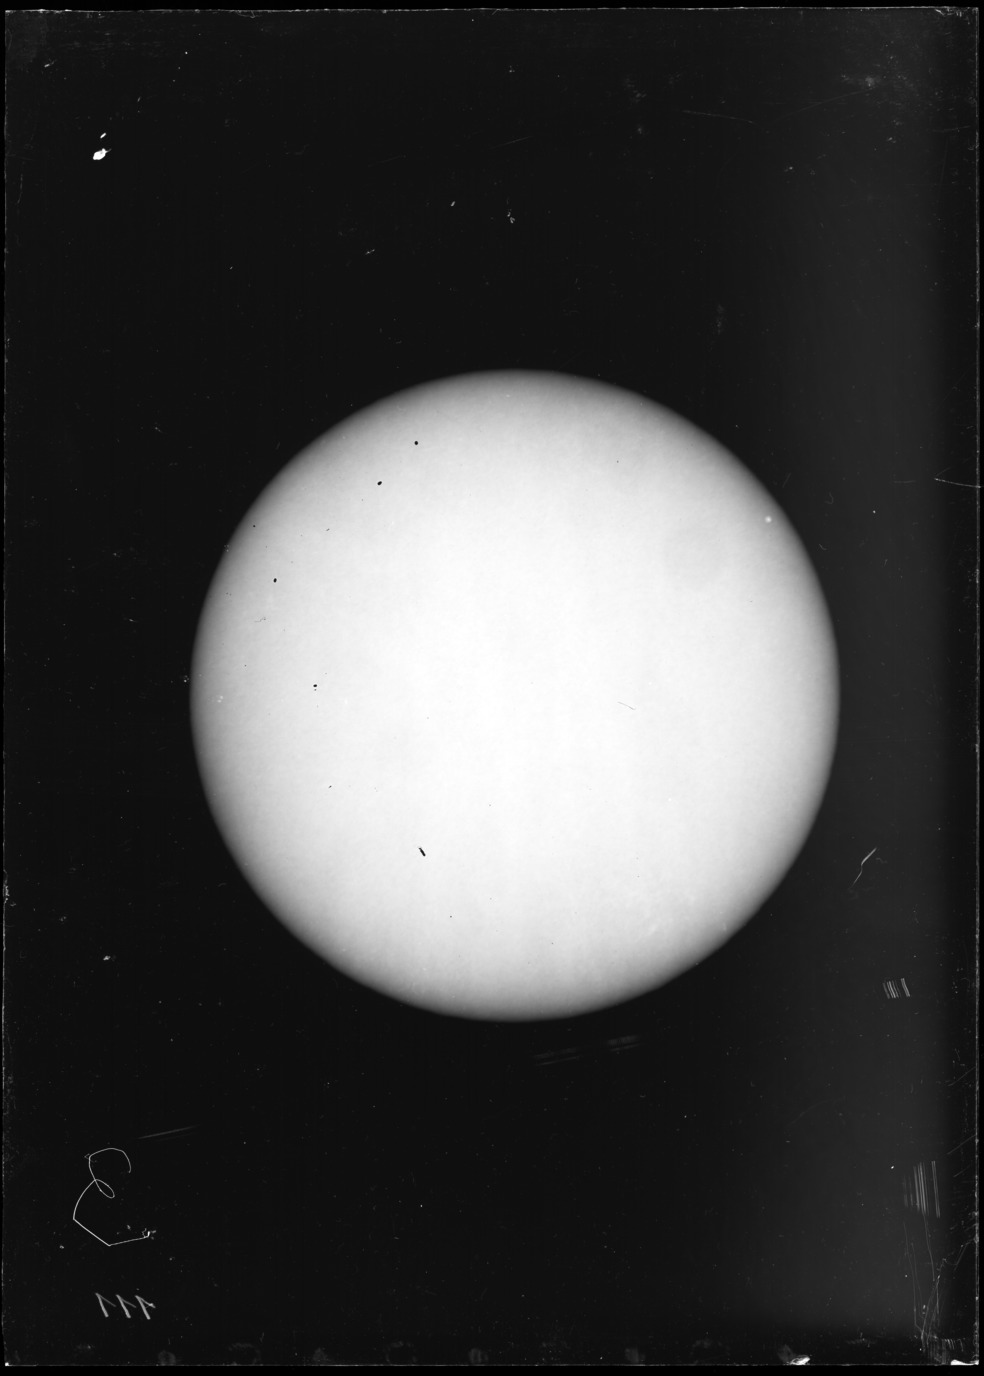 AGlV111